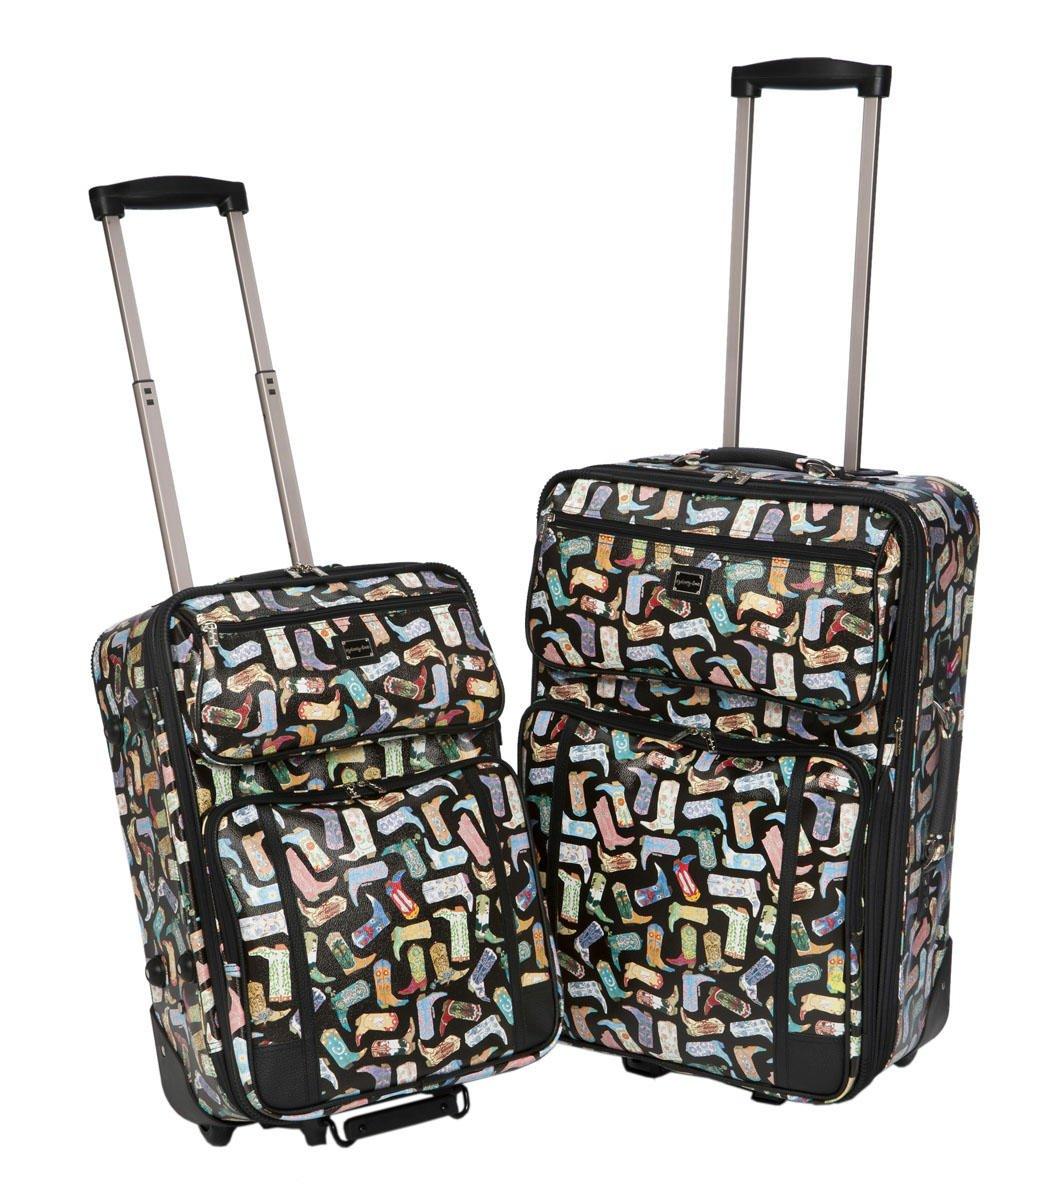 Sydney Love Kickin' It 2 Piece Luggage Set 12785 Weekender,Multi,One Size